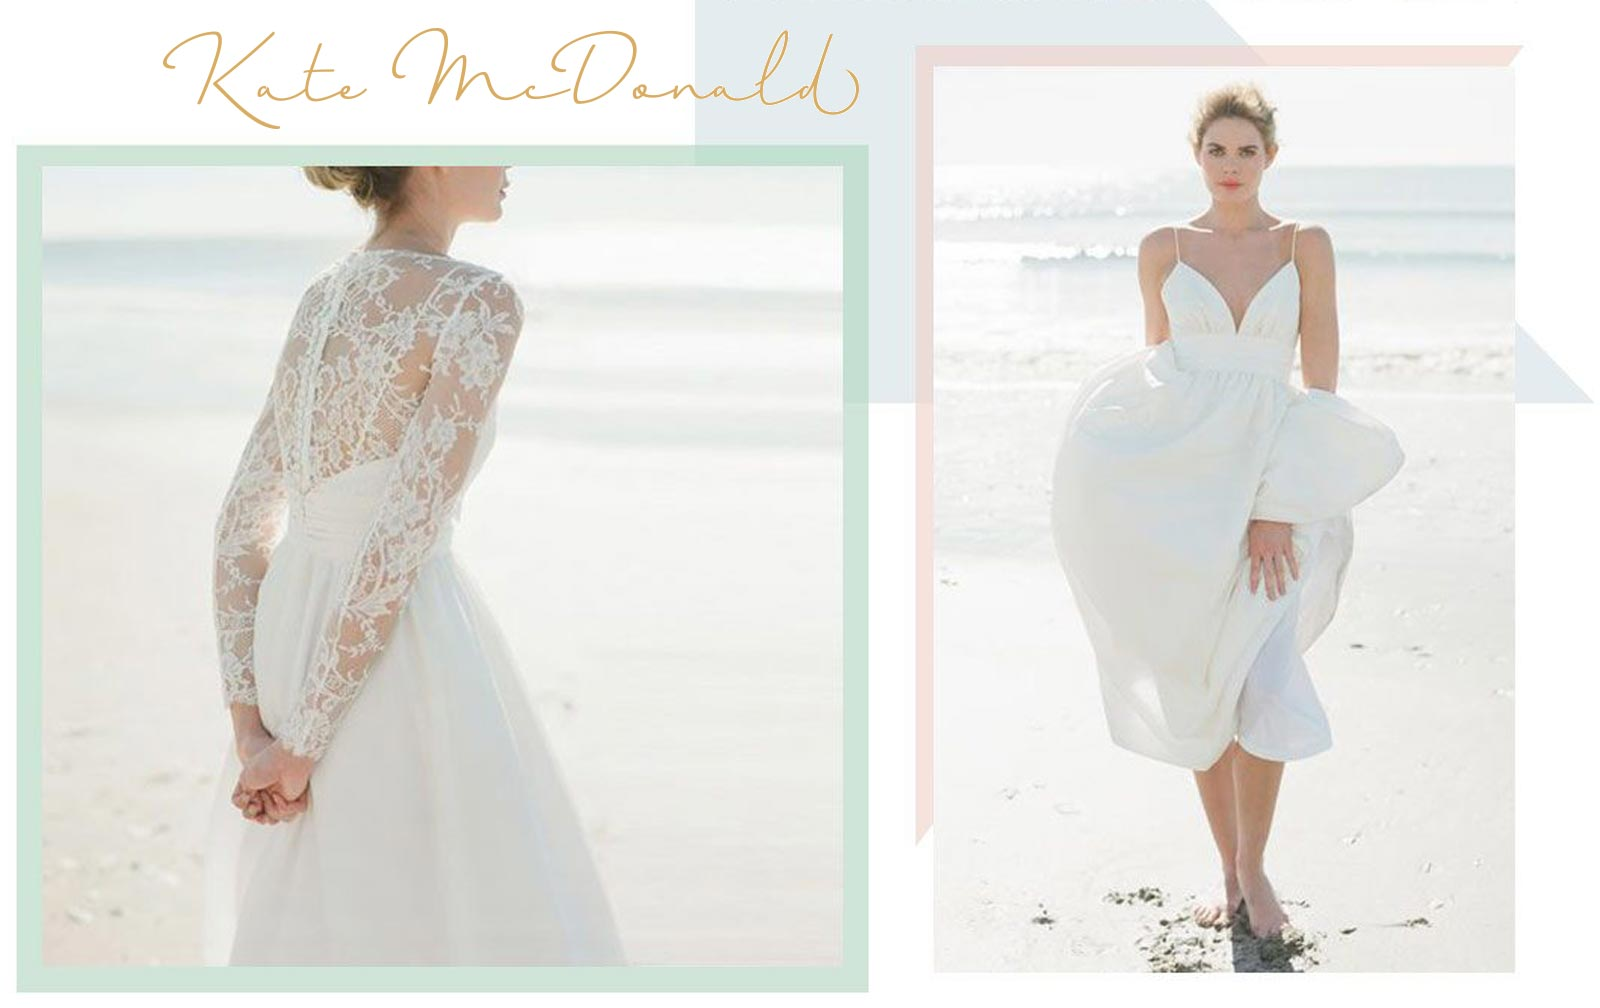 Brides of Houston Wedding Event - Kate McDonald Trunk Show